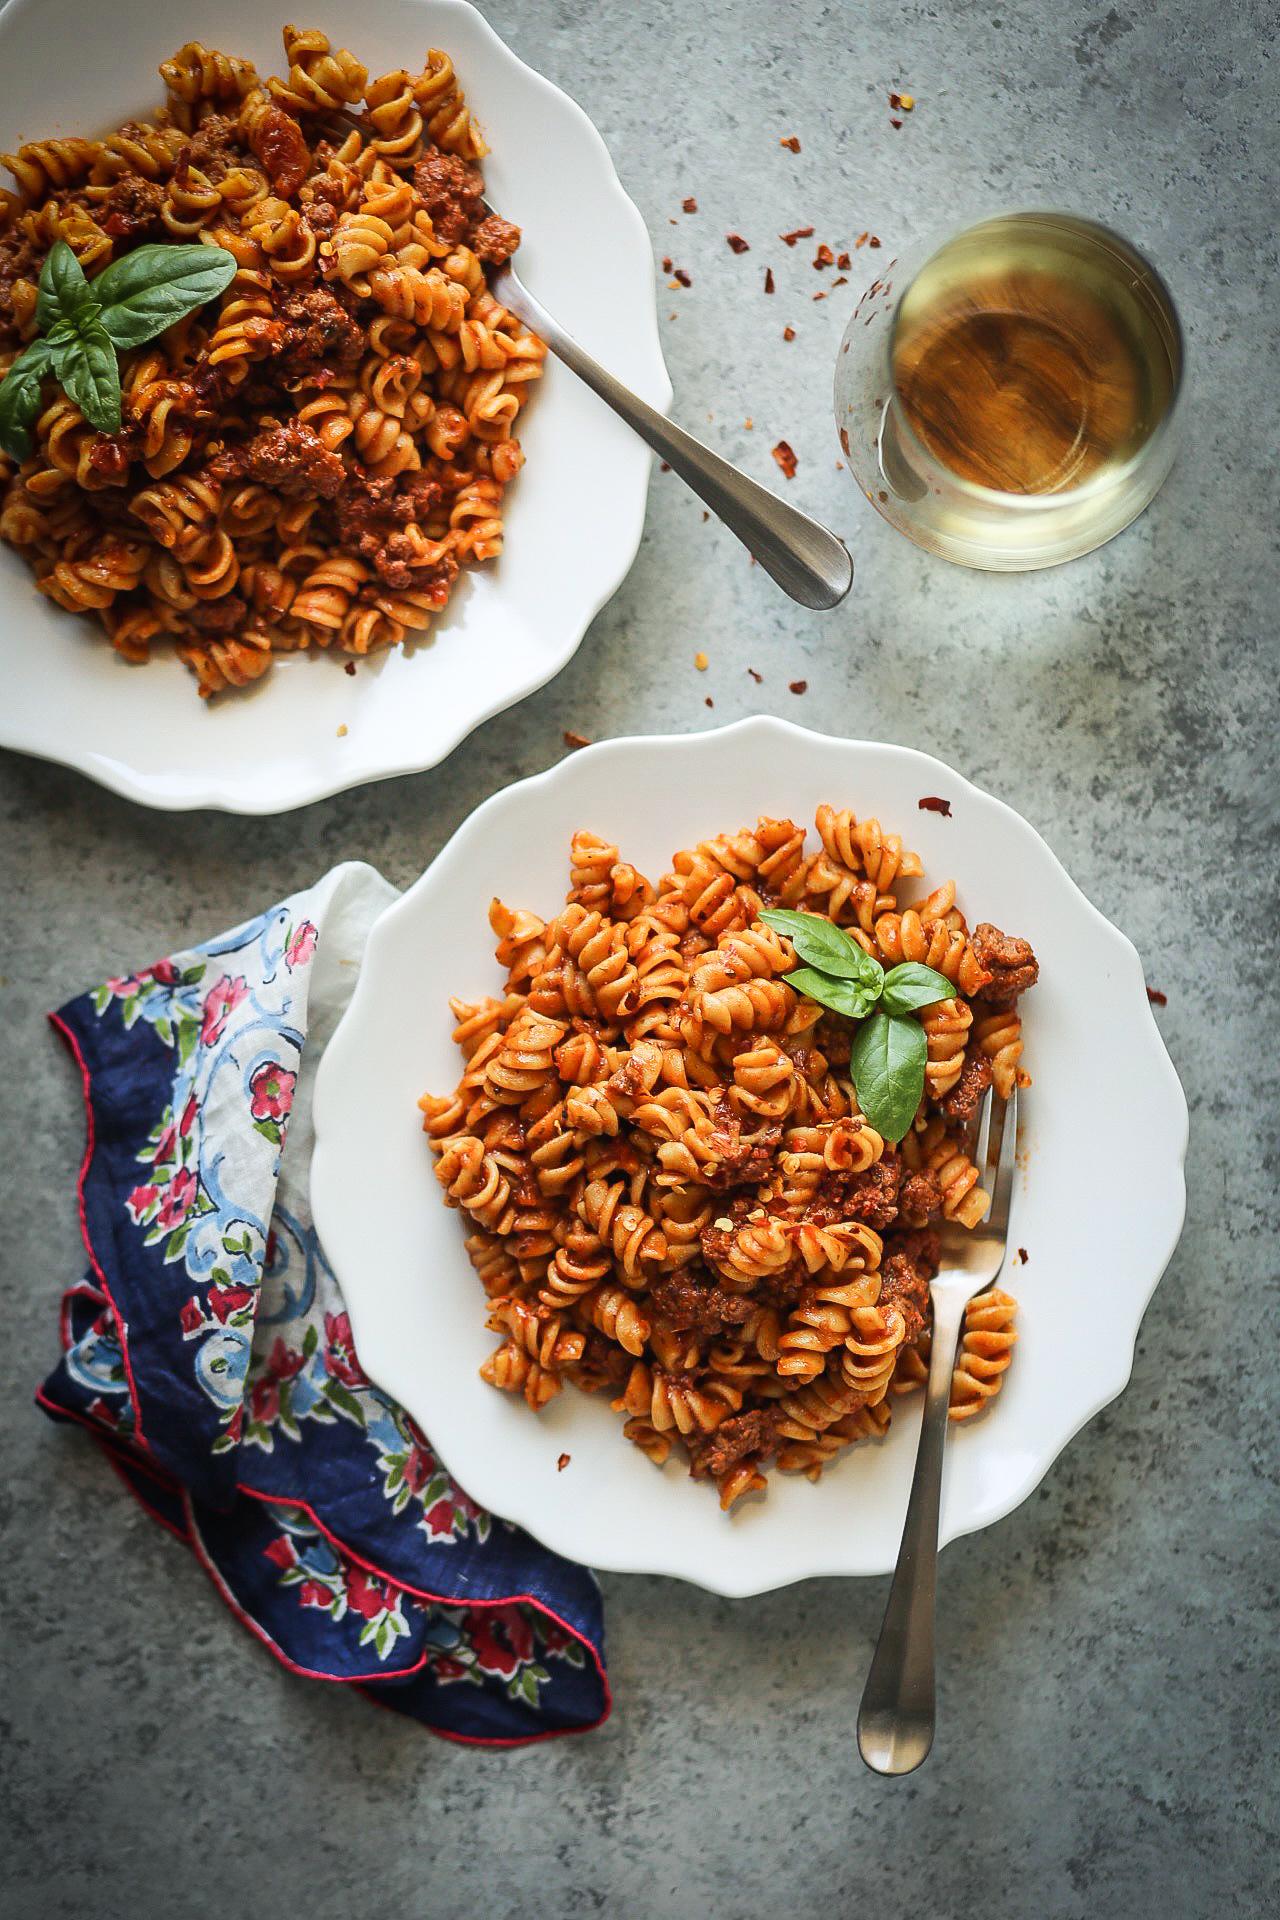 Instant Pot Pasta with Meat Sauce | Set the Table #instantpot #recipes #pasta #onepotmeal #dinnertonight